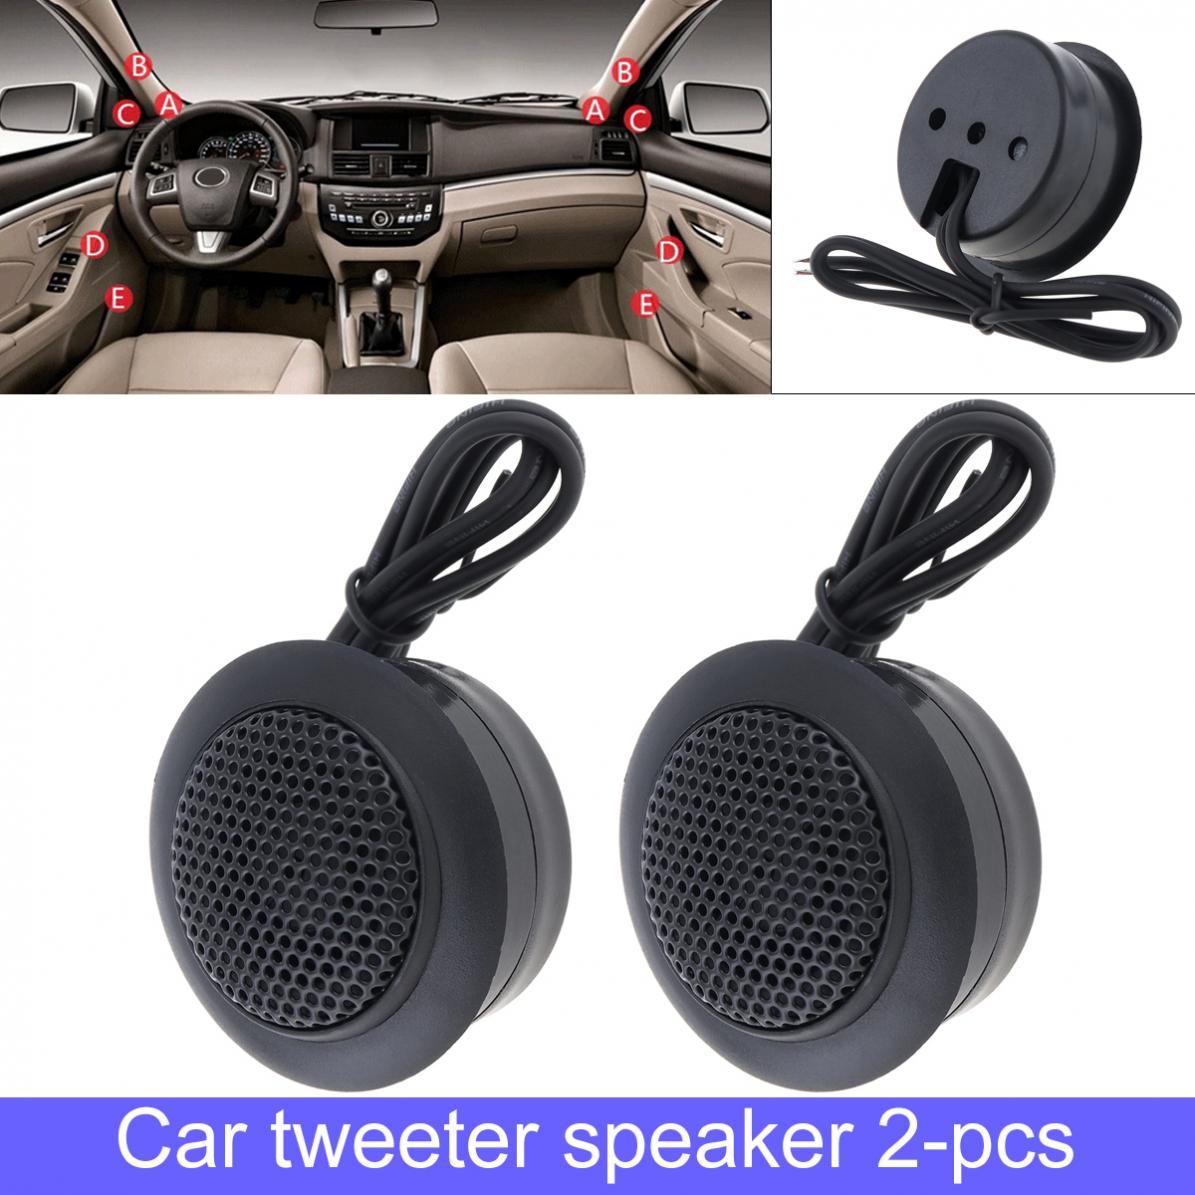 Car Tweeter Speaker Stereo Music Dome Horn Mini Portable Car Tweeter Speaker Auto Audio System Car Audio Loudspeakers Modification Stereo Speaker